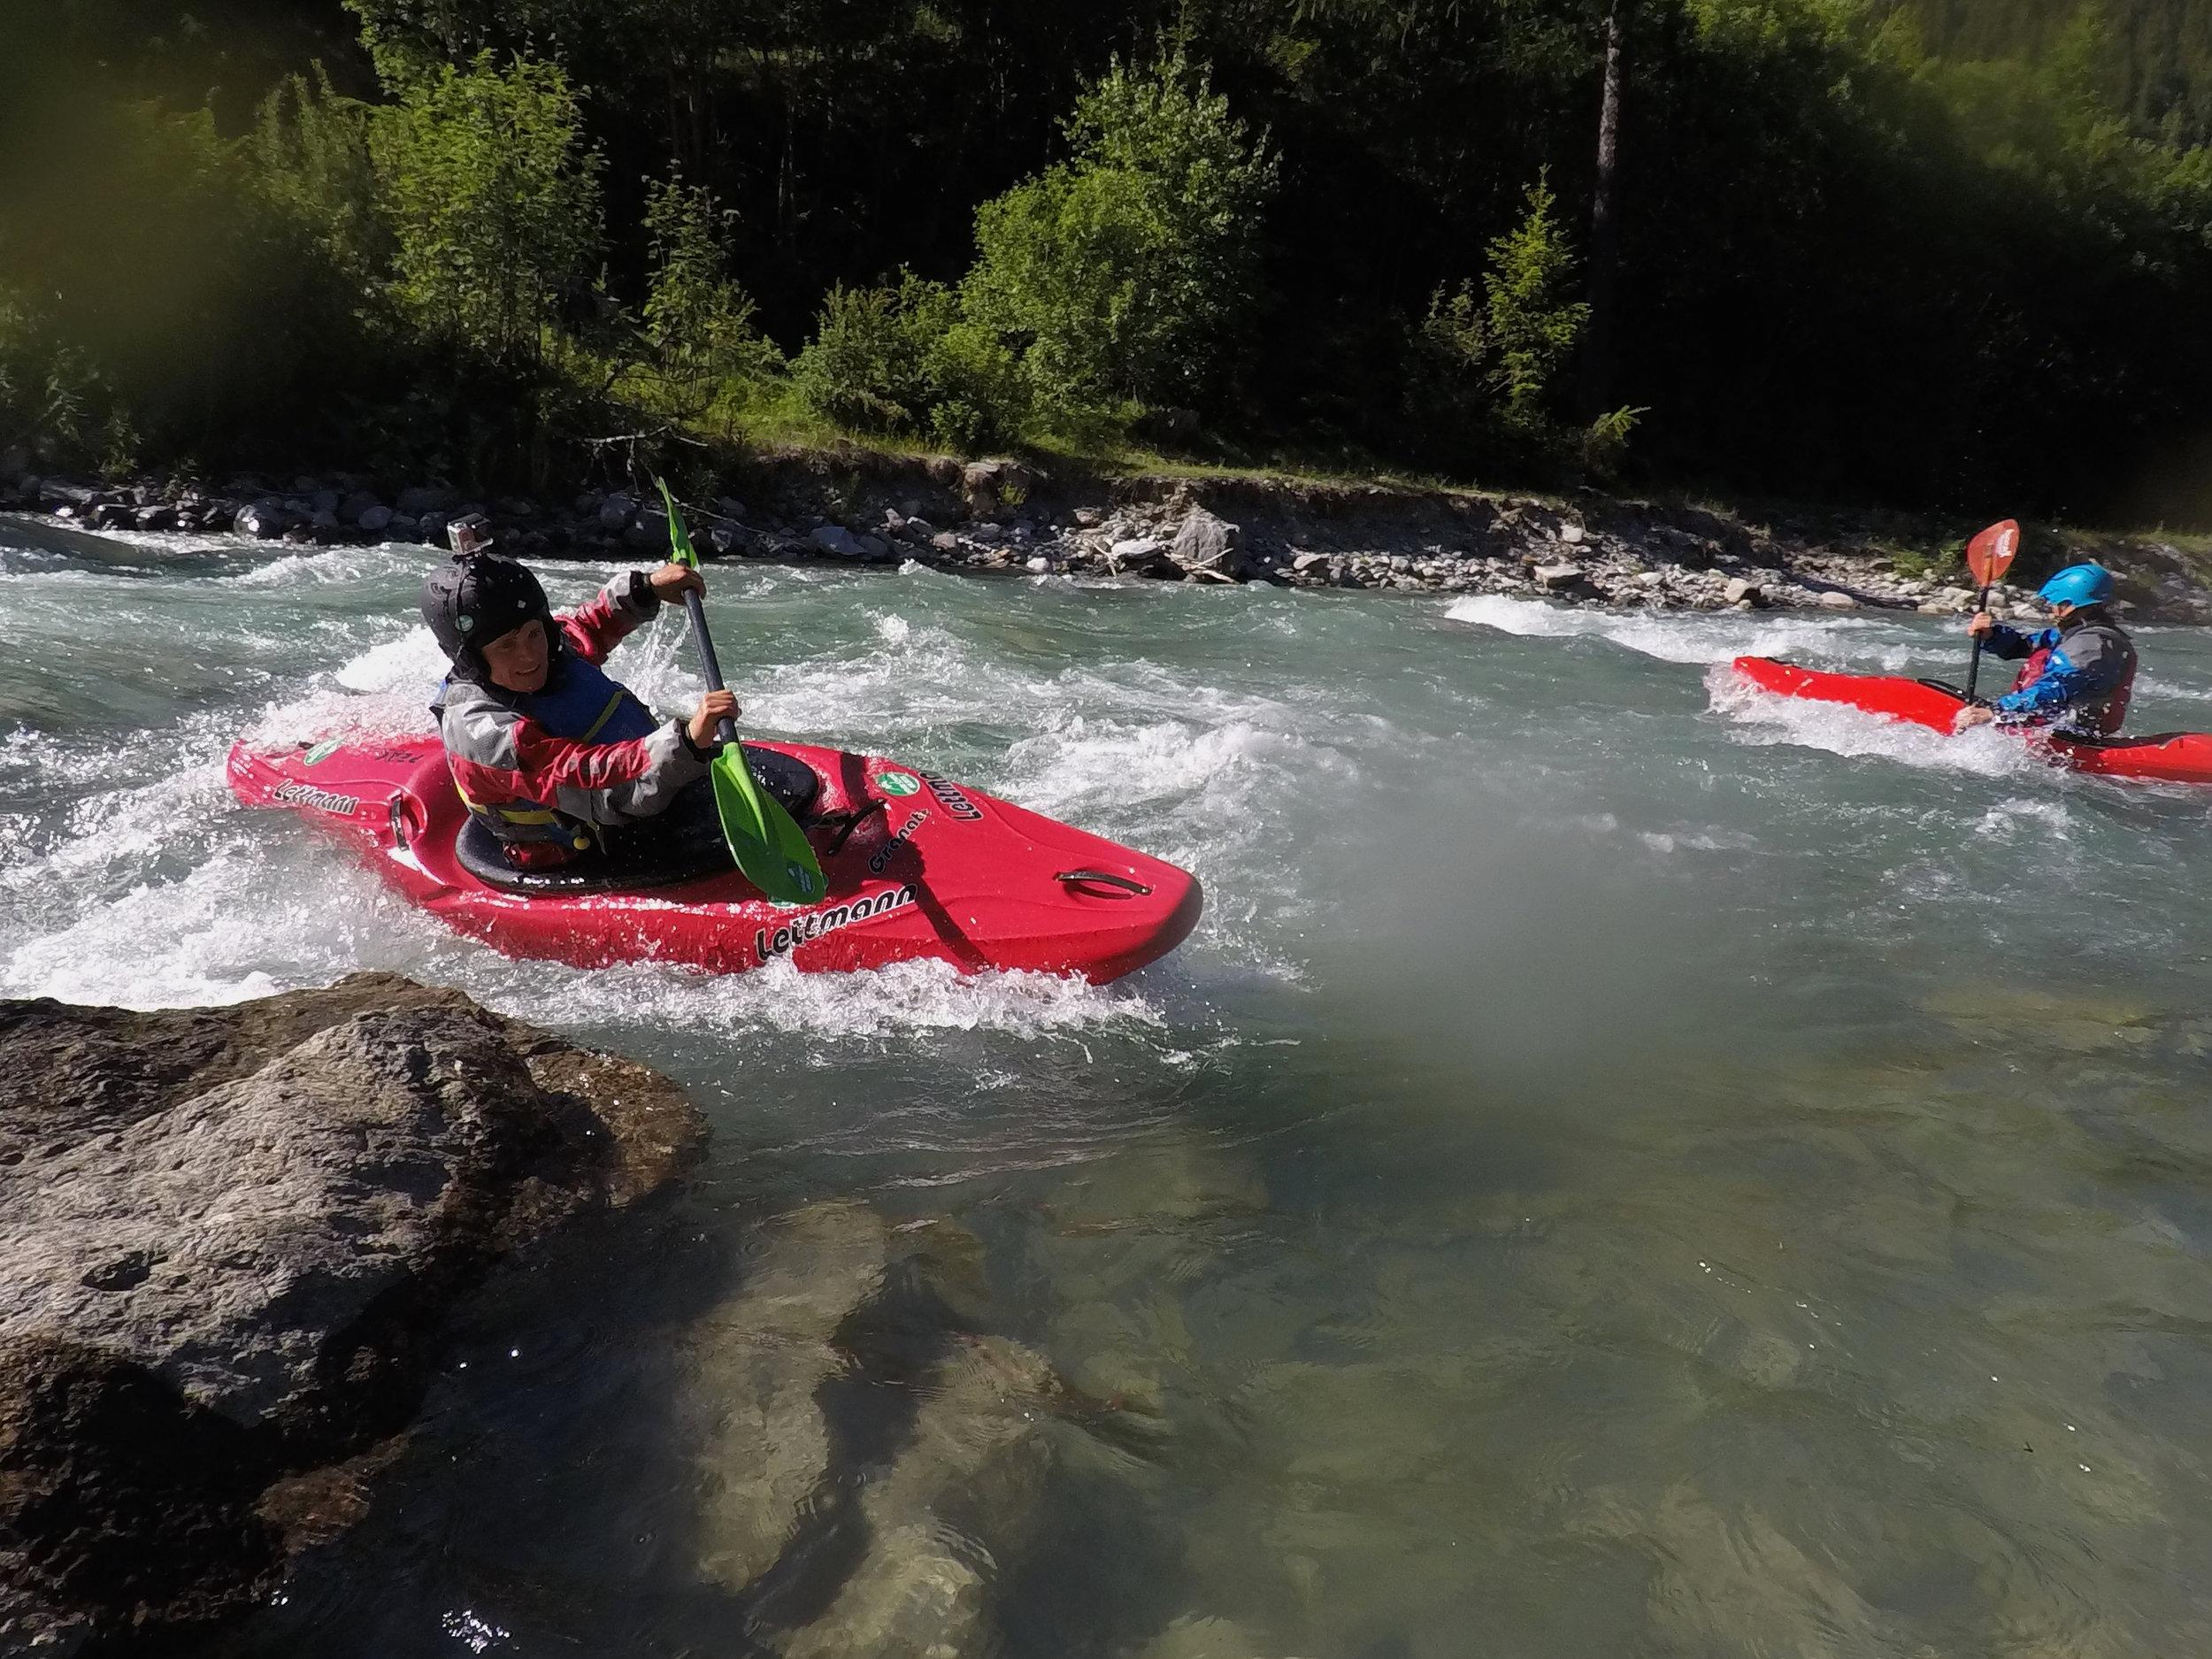 Kayak-School-Austria-Spring-Summer-2017-027.jpg